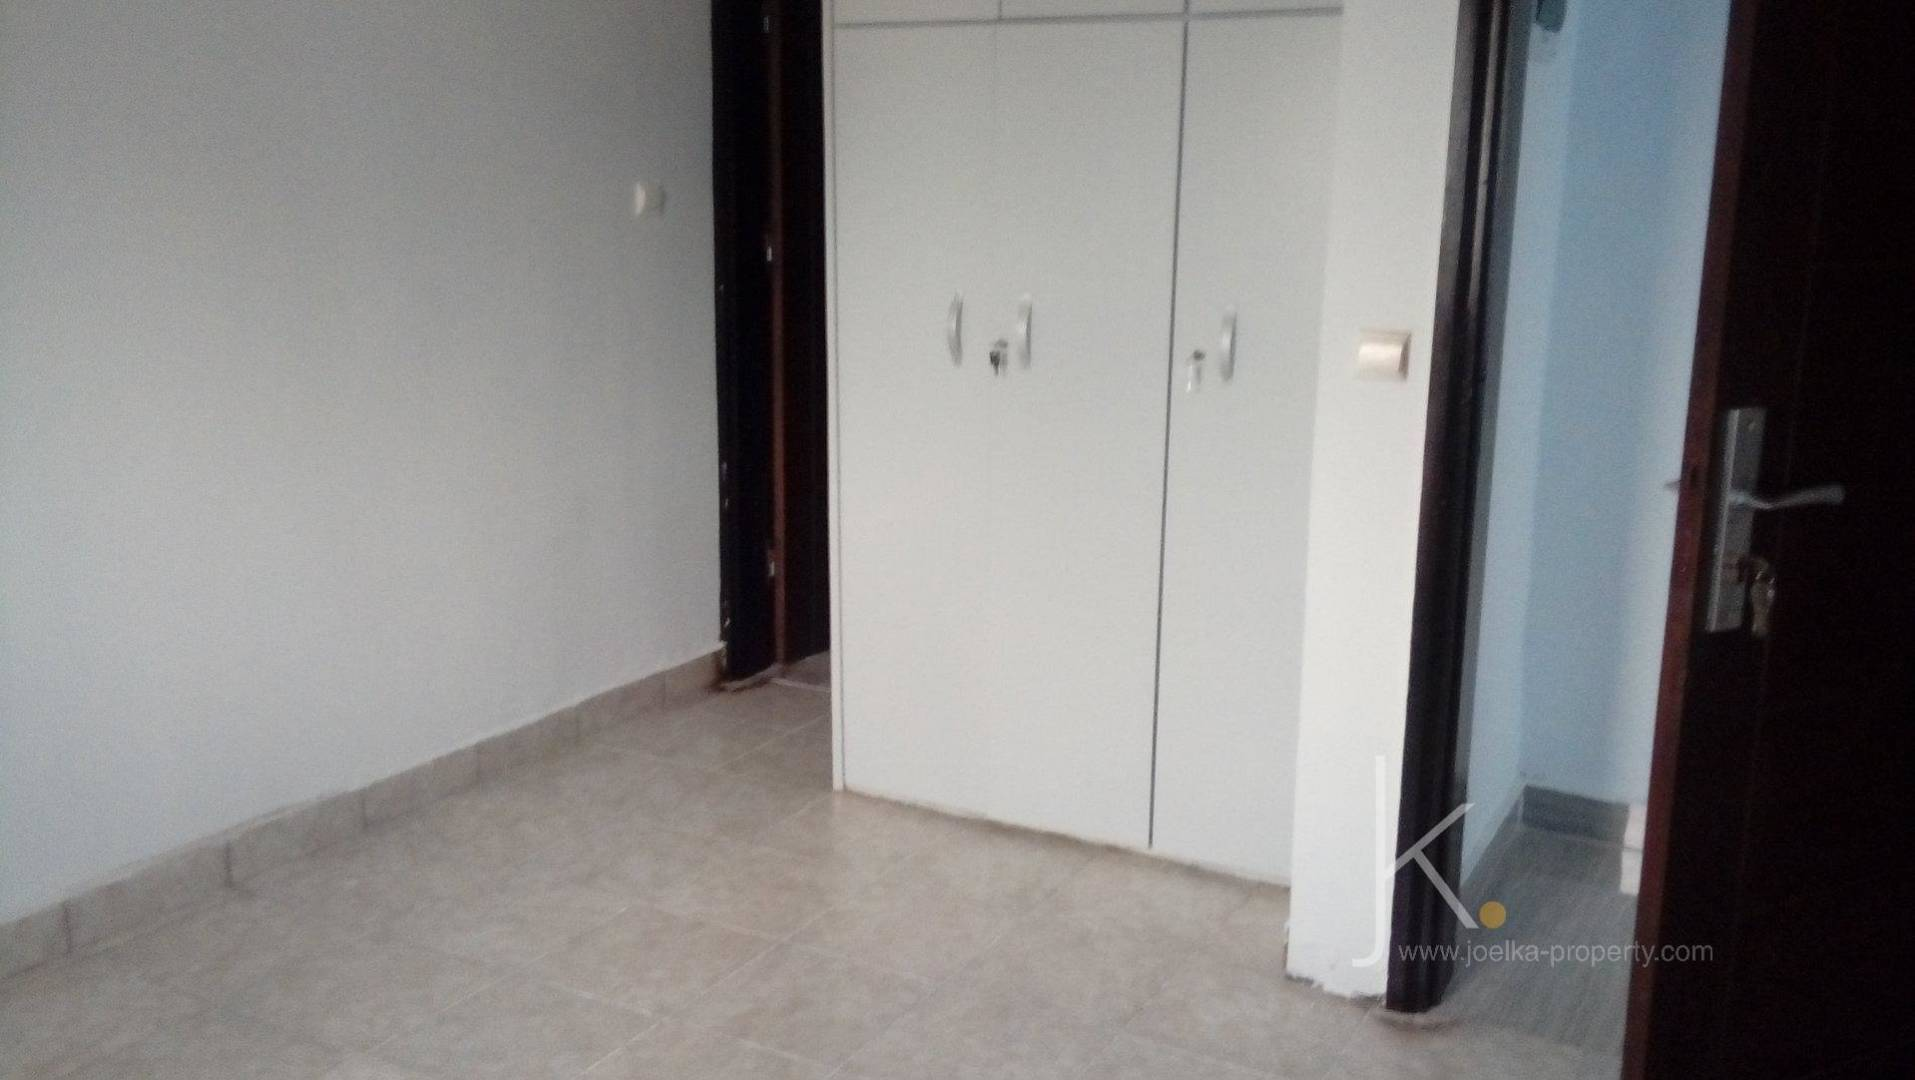 Couloir Carrelage